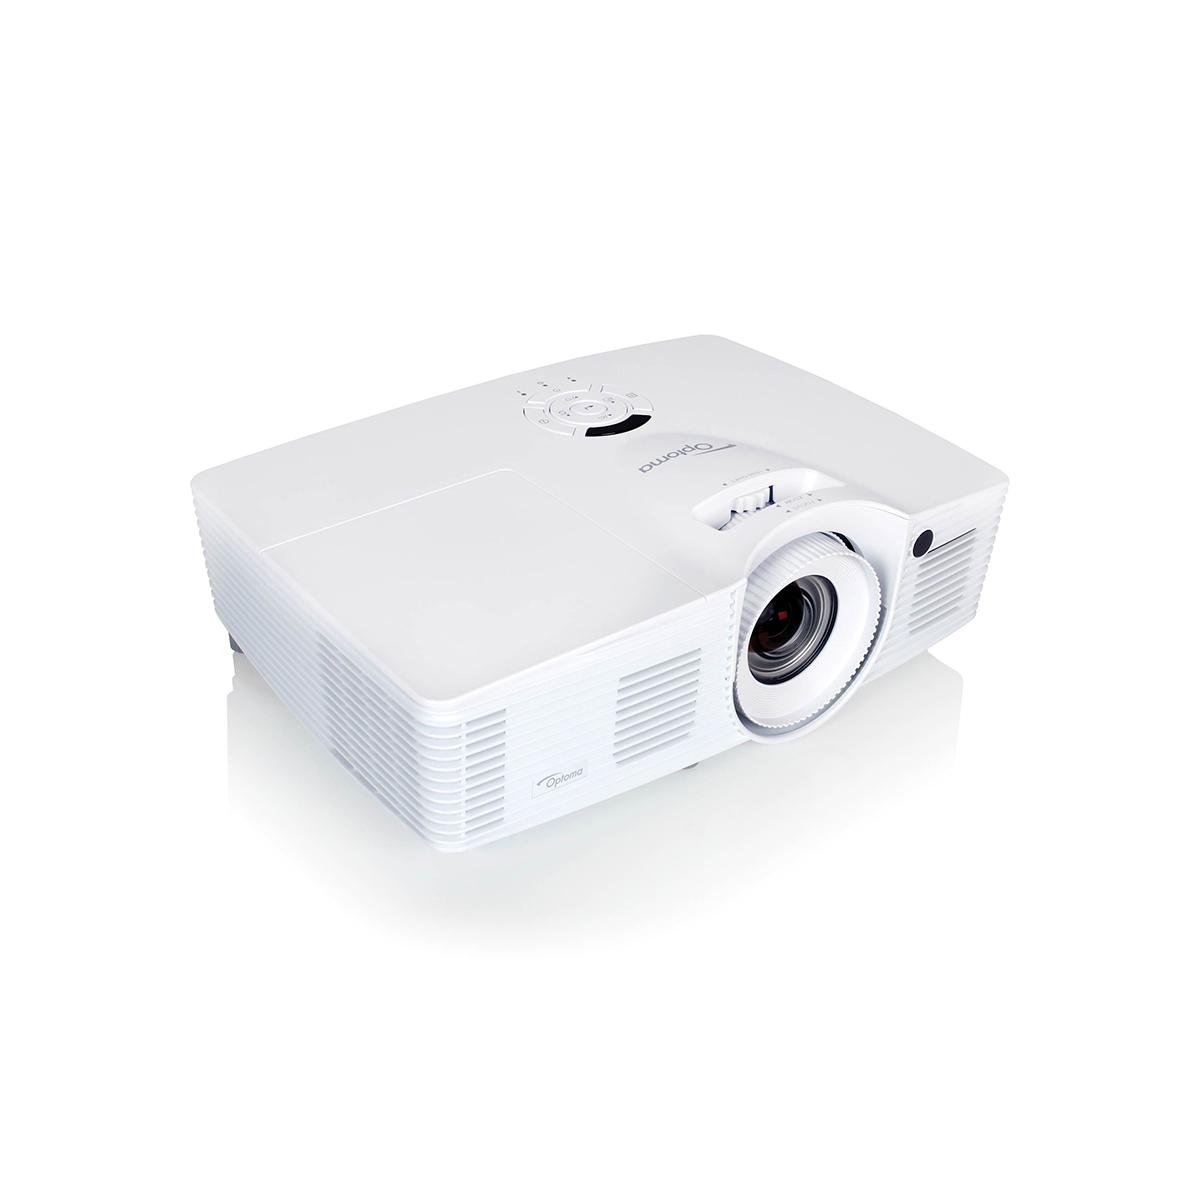 Optoma W416 WXGA Compact Projector